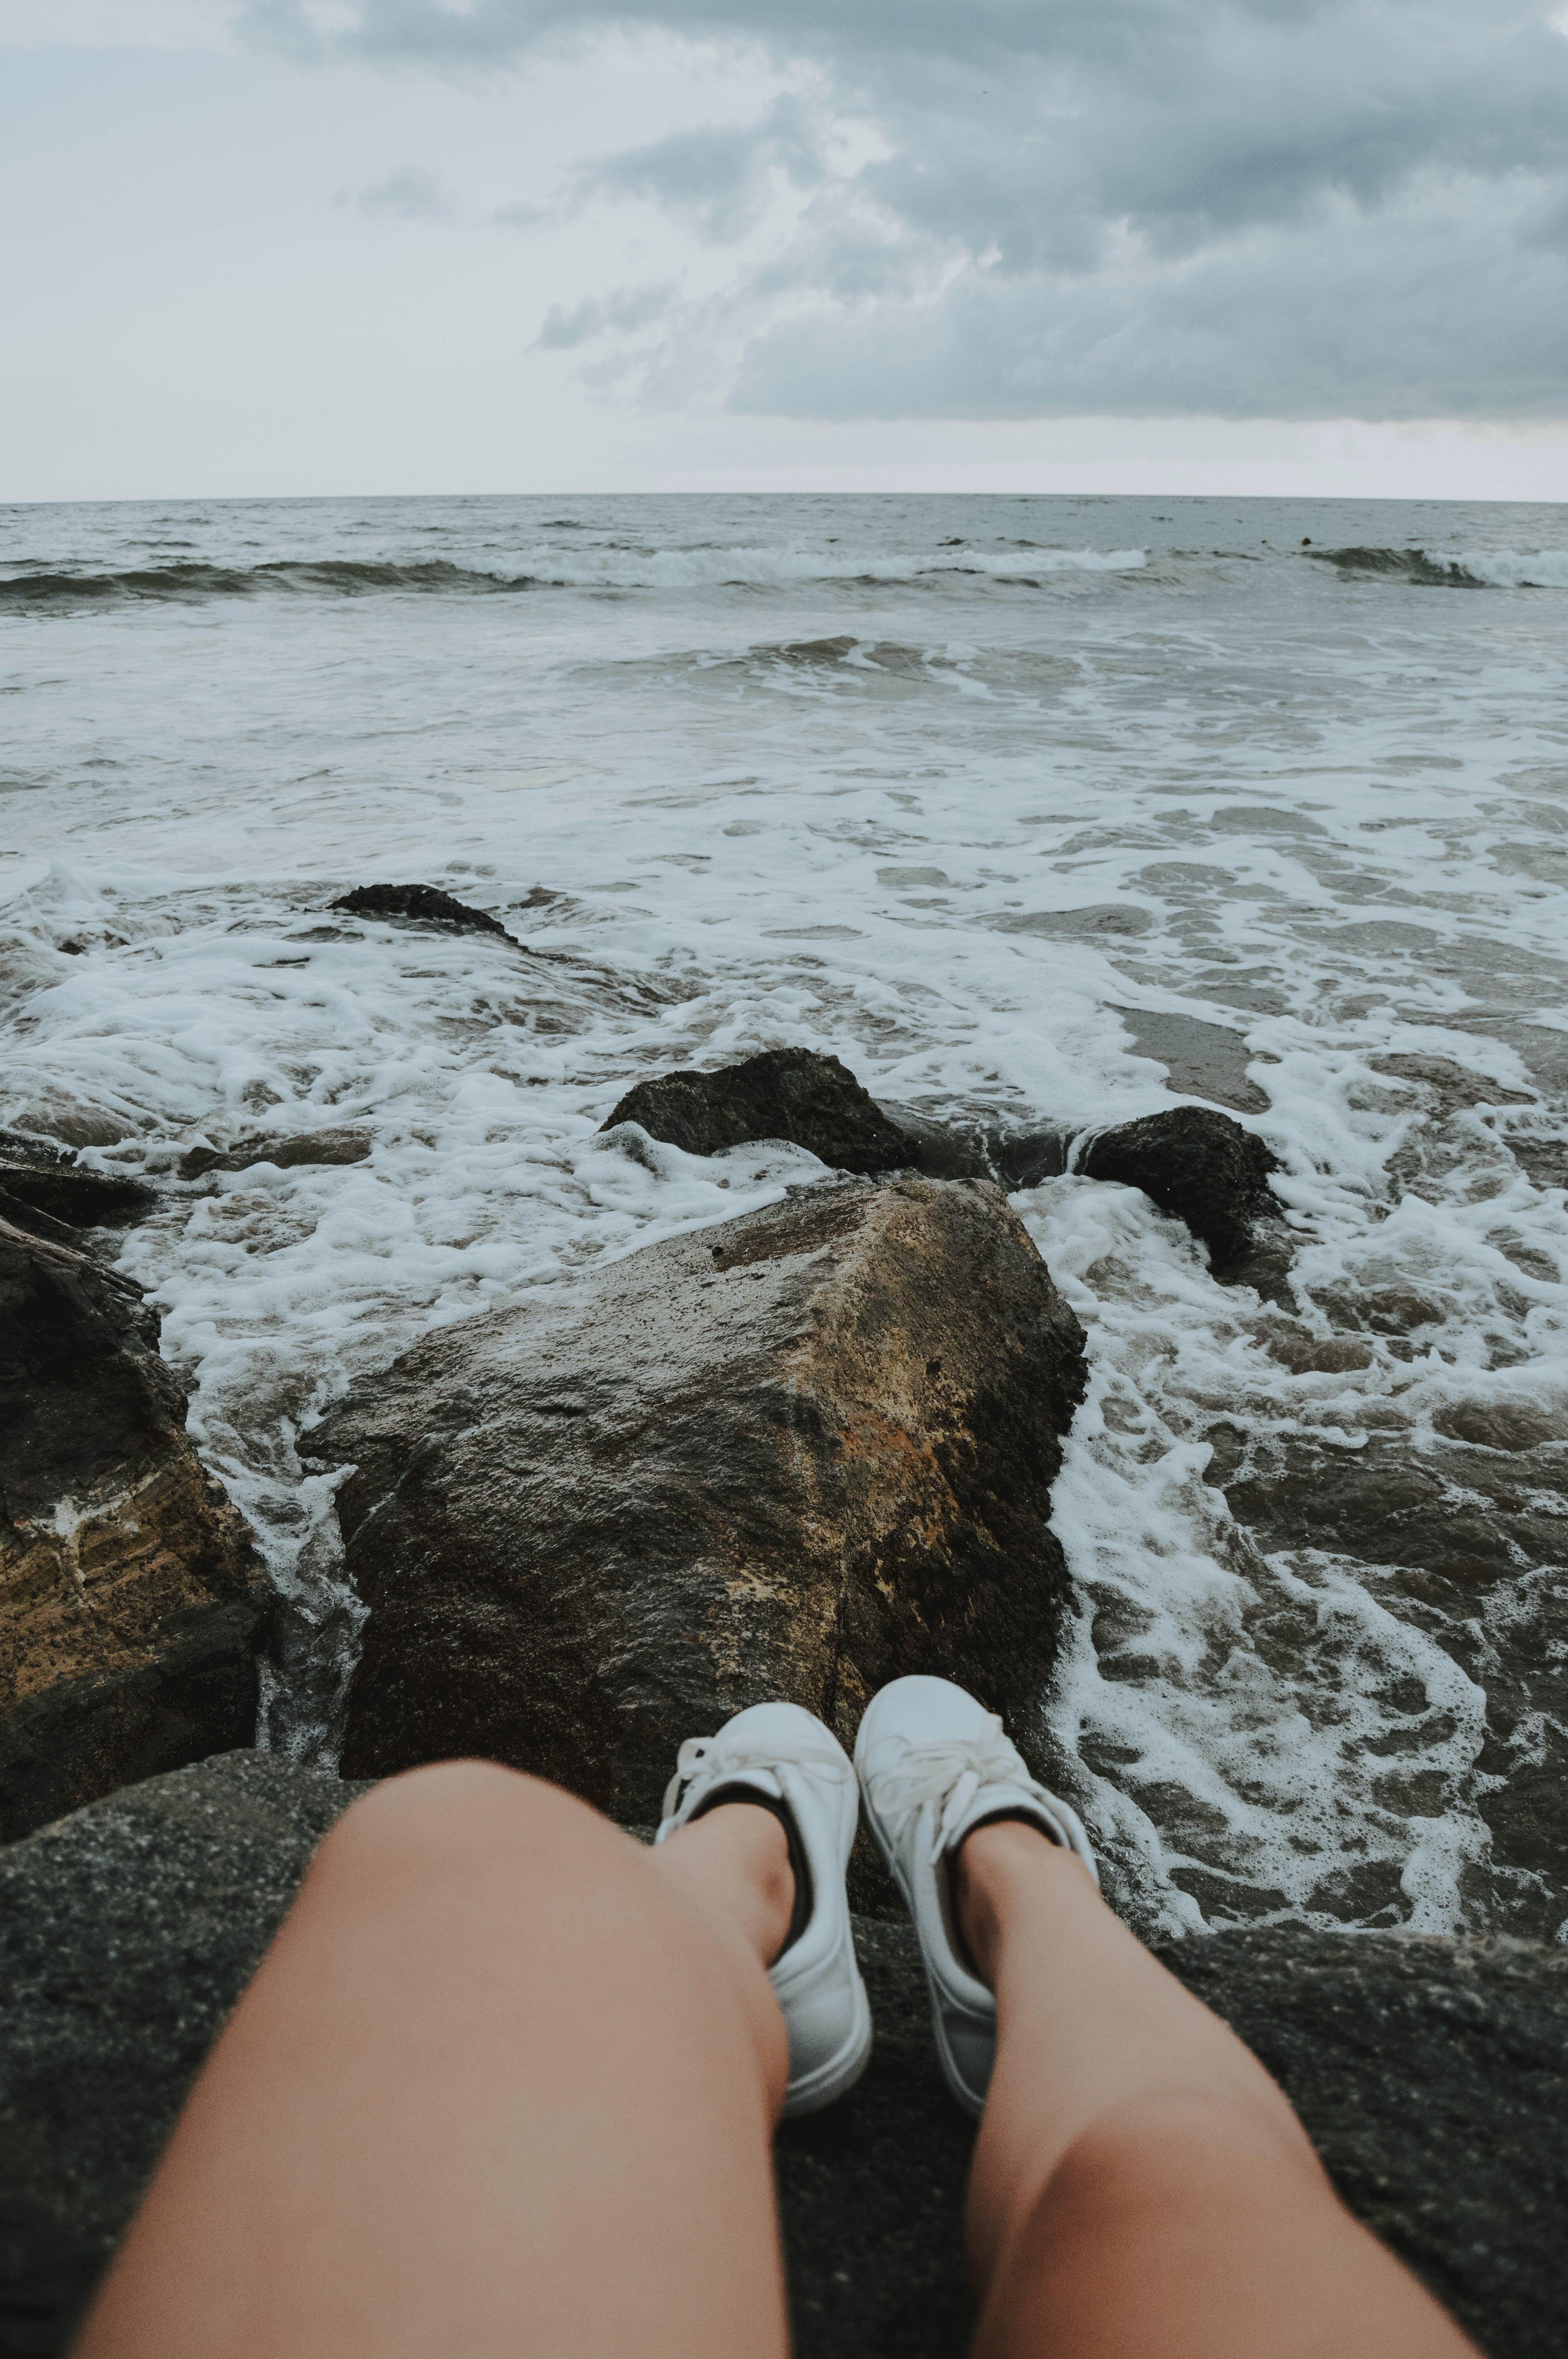 Person Sitting on Rocks